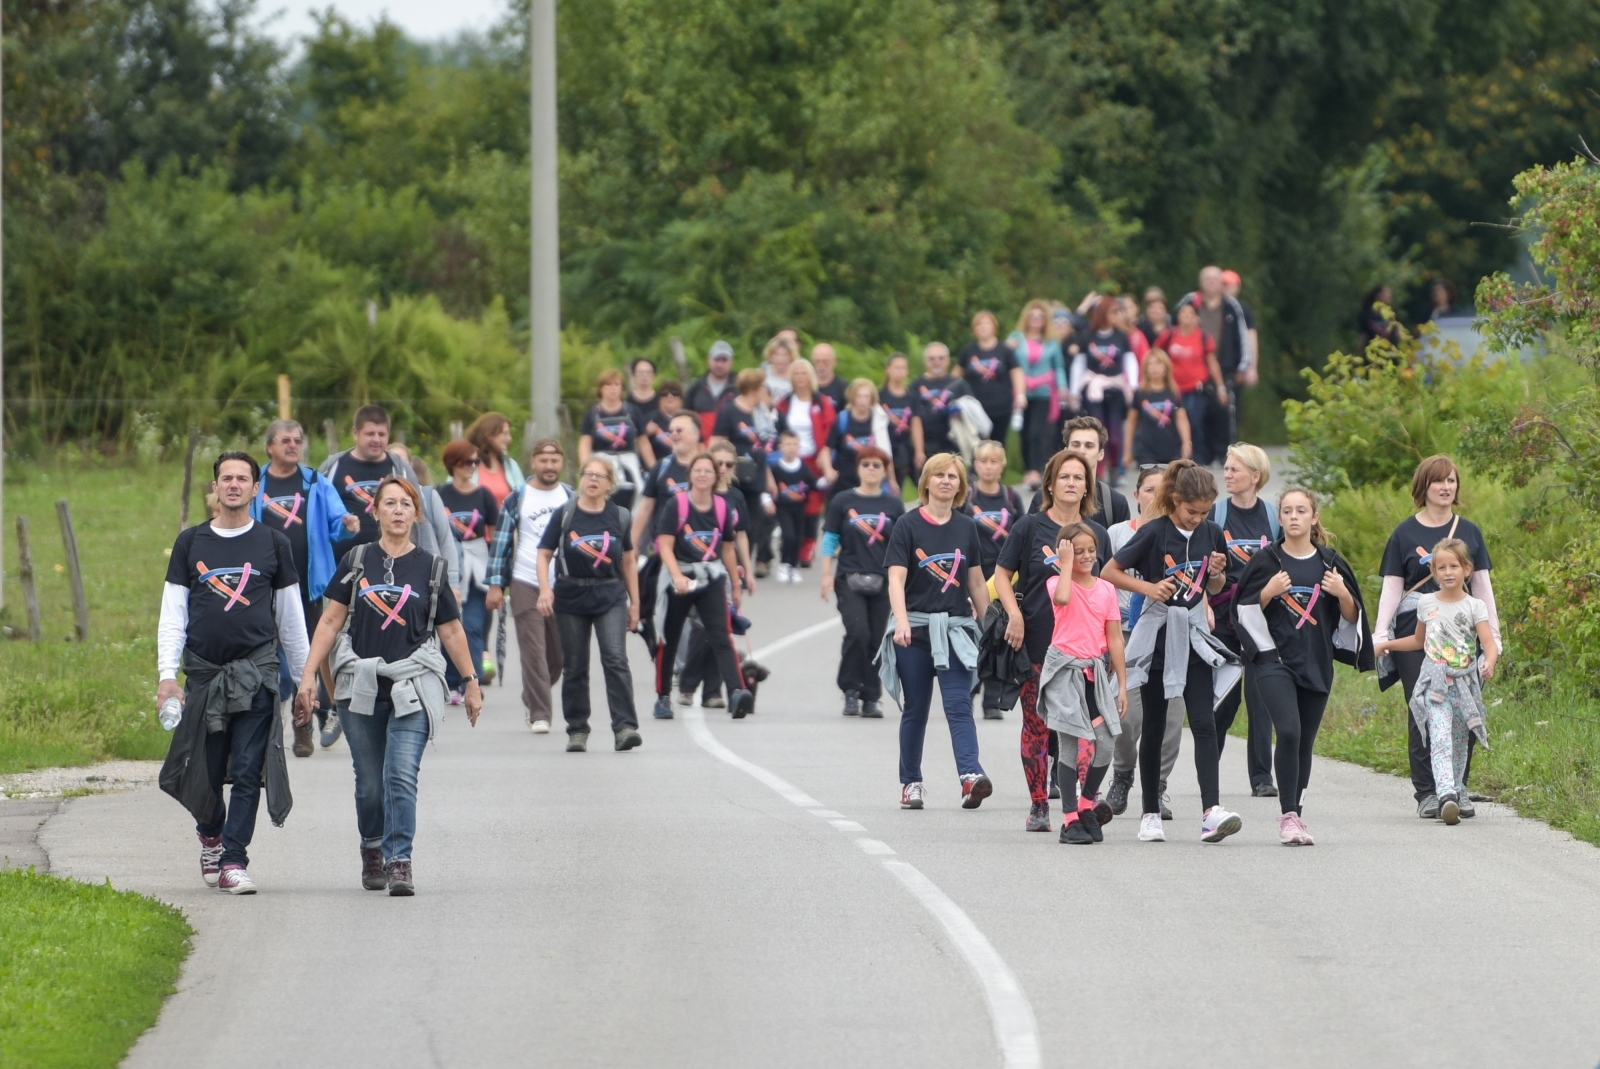 Hrvatski festival hodanja u Lici okupio brojne rekreativce